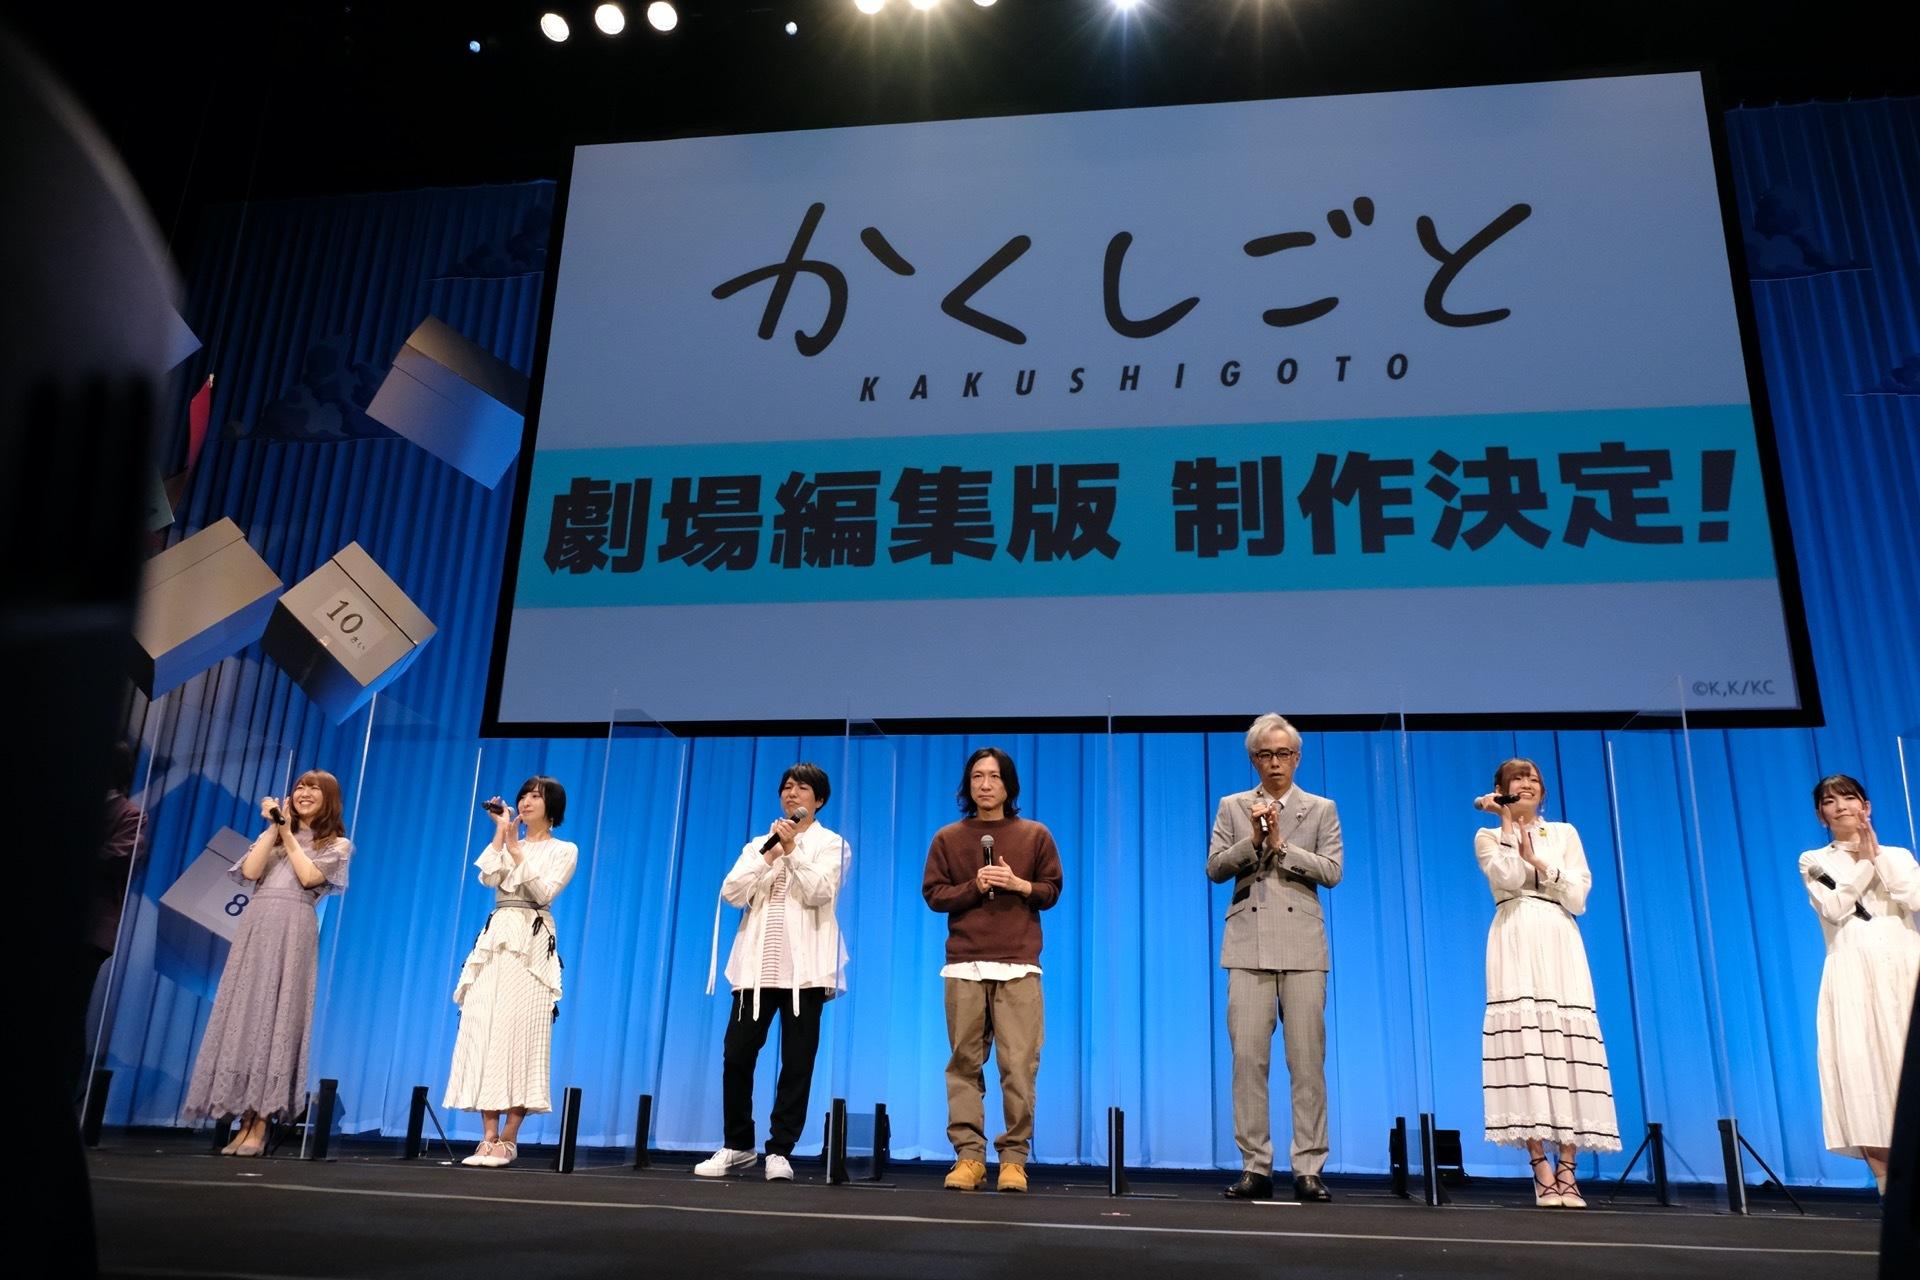 (C)久米田康治・講談社/かくしごと製作委員会